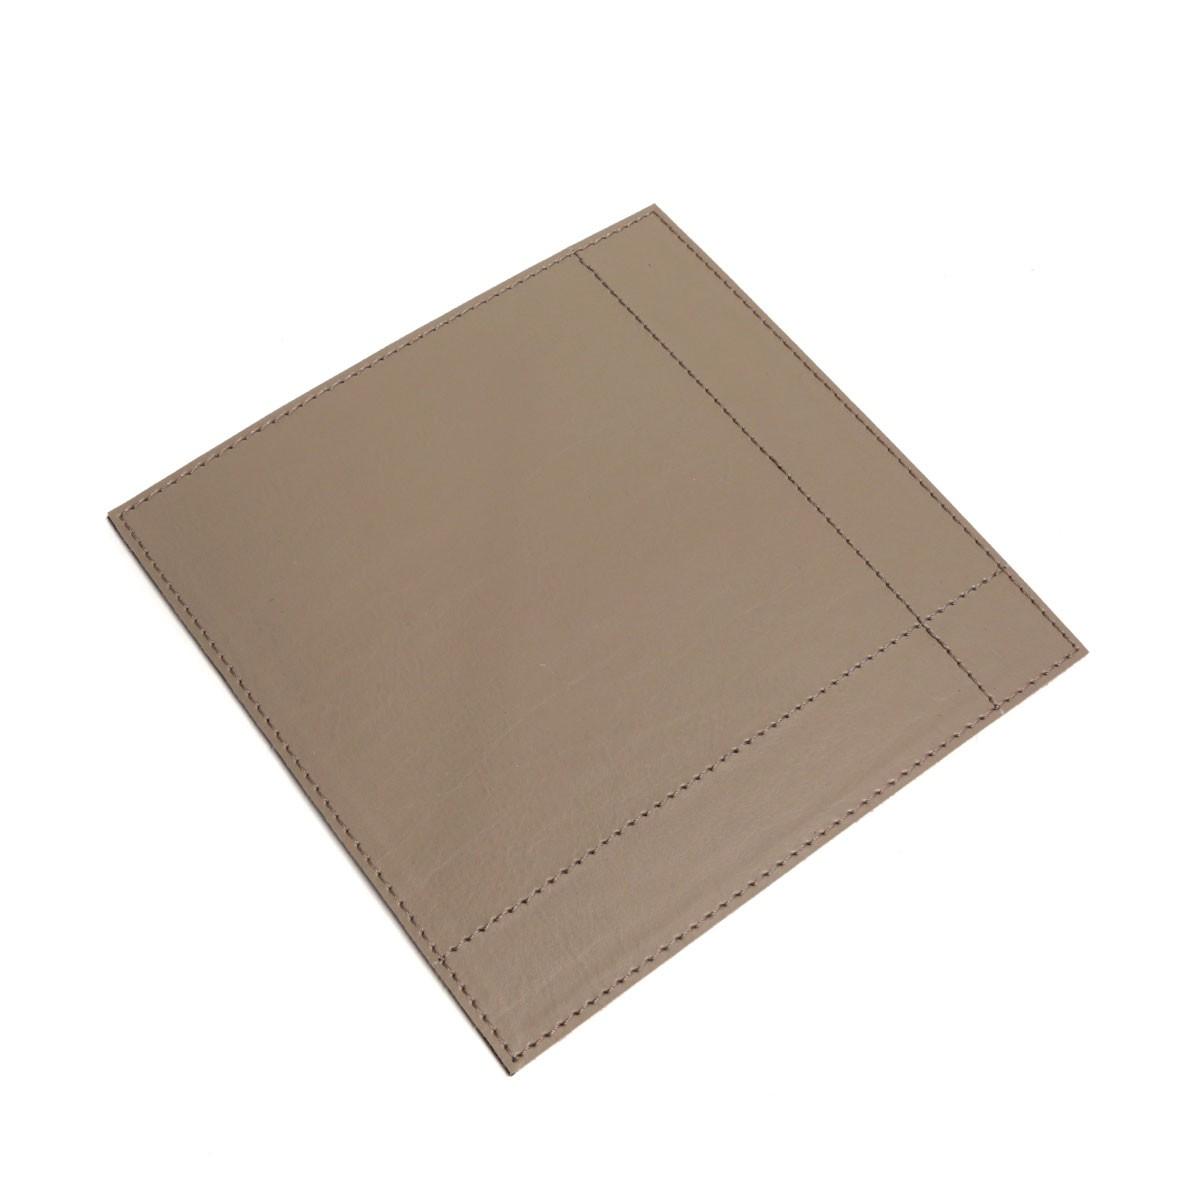 Mouse pad (Montana Fendi)